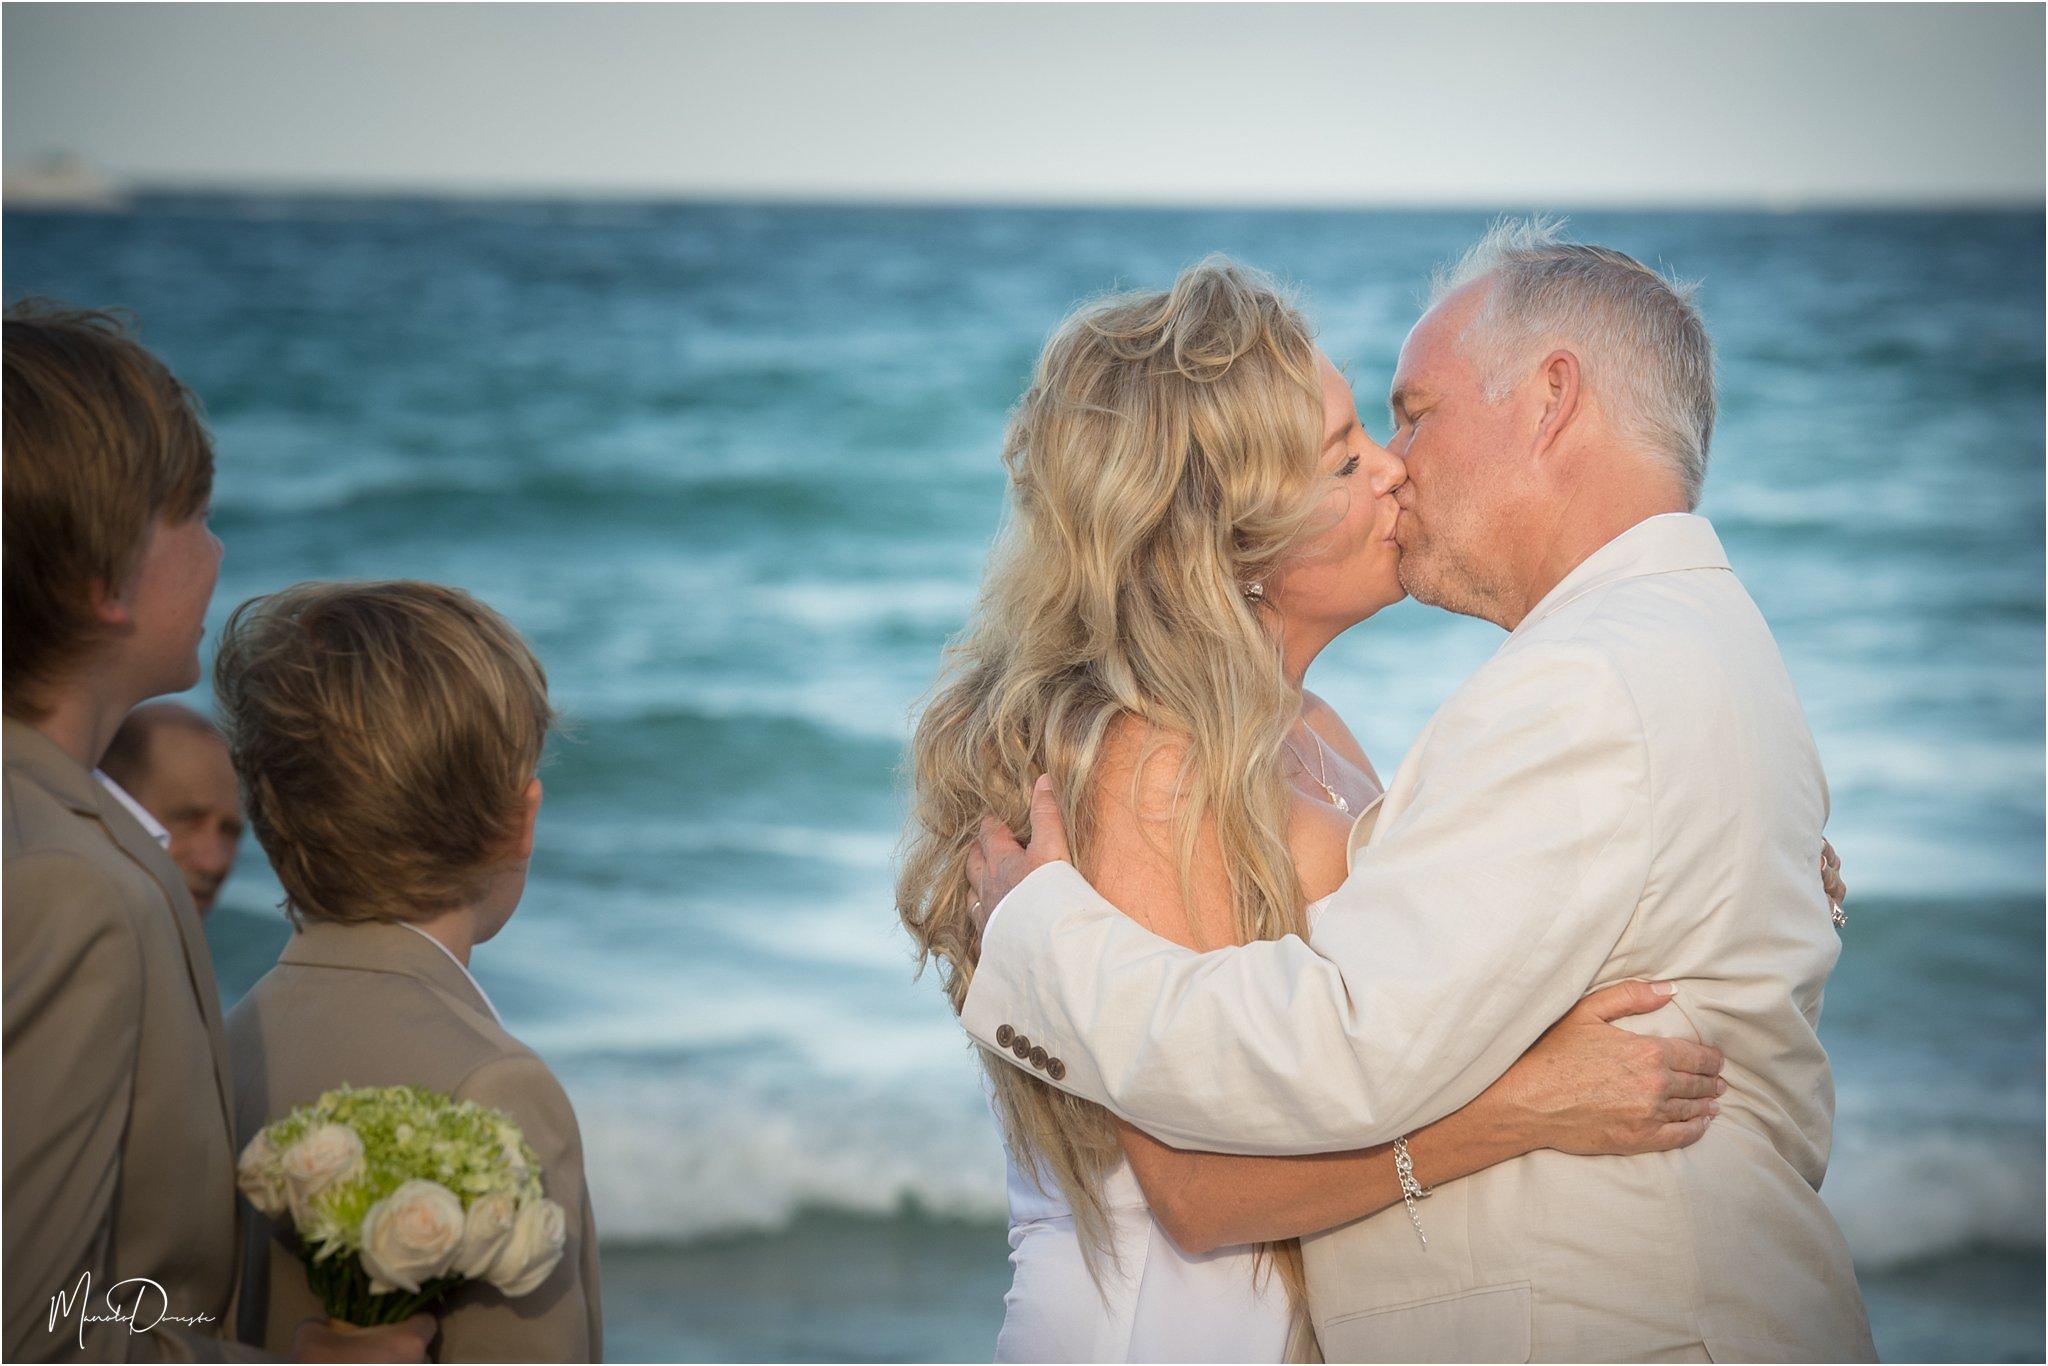 0394_ManoloDoreste_InFocusStudios_Wedding_Family_Photography_Miami_MiamiPhotographer.jpg